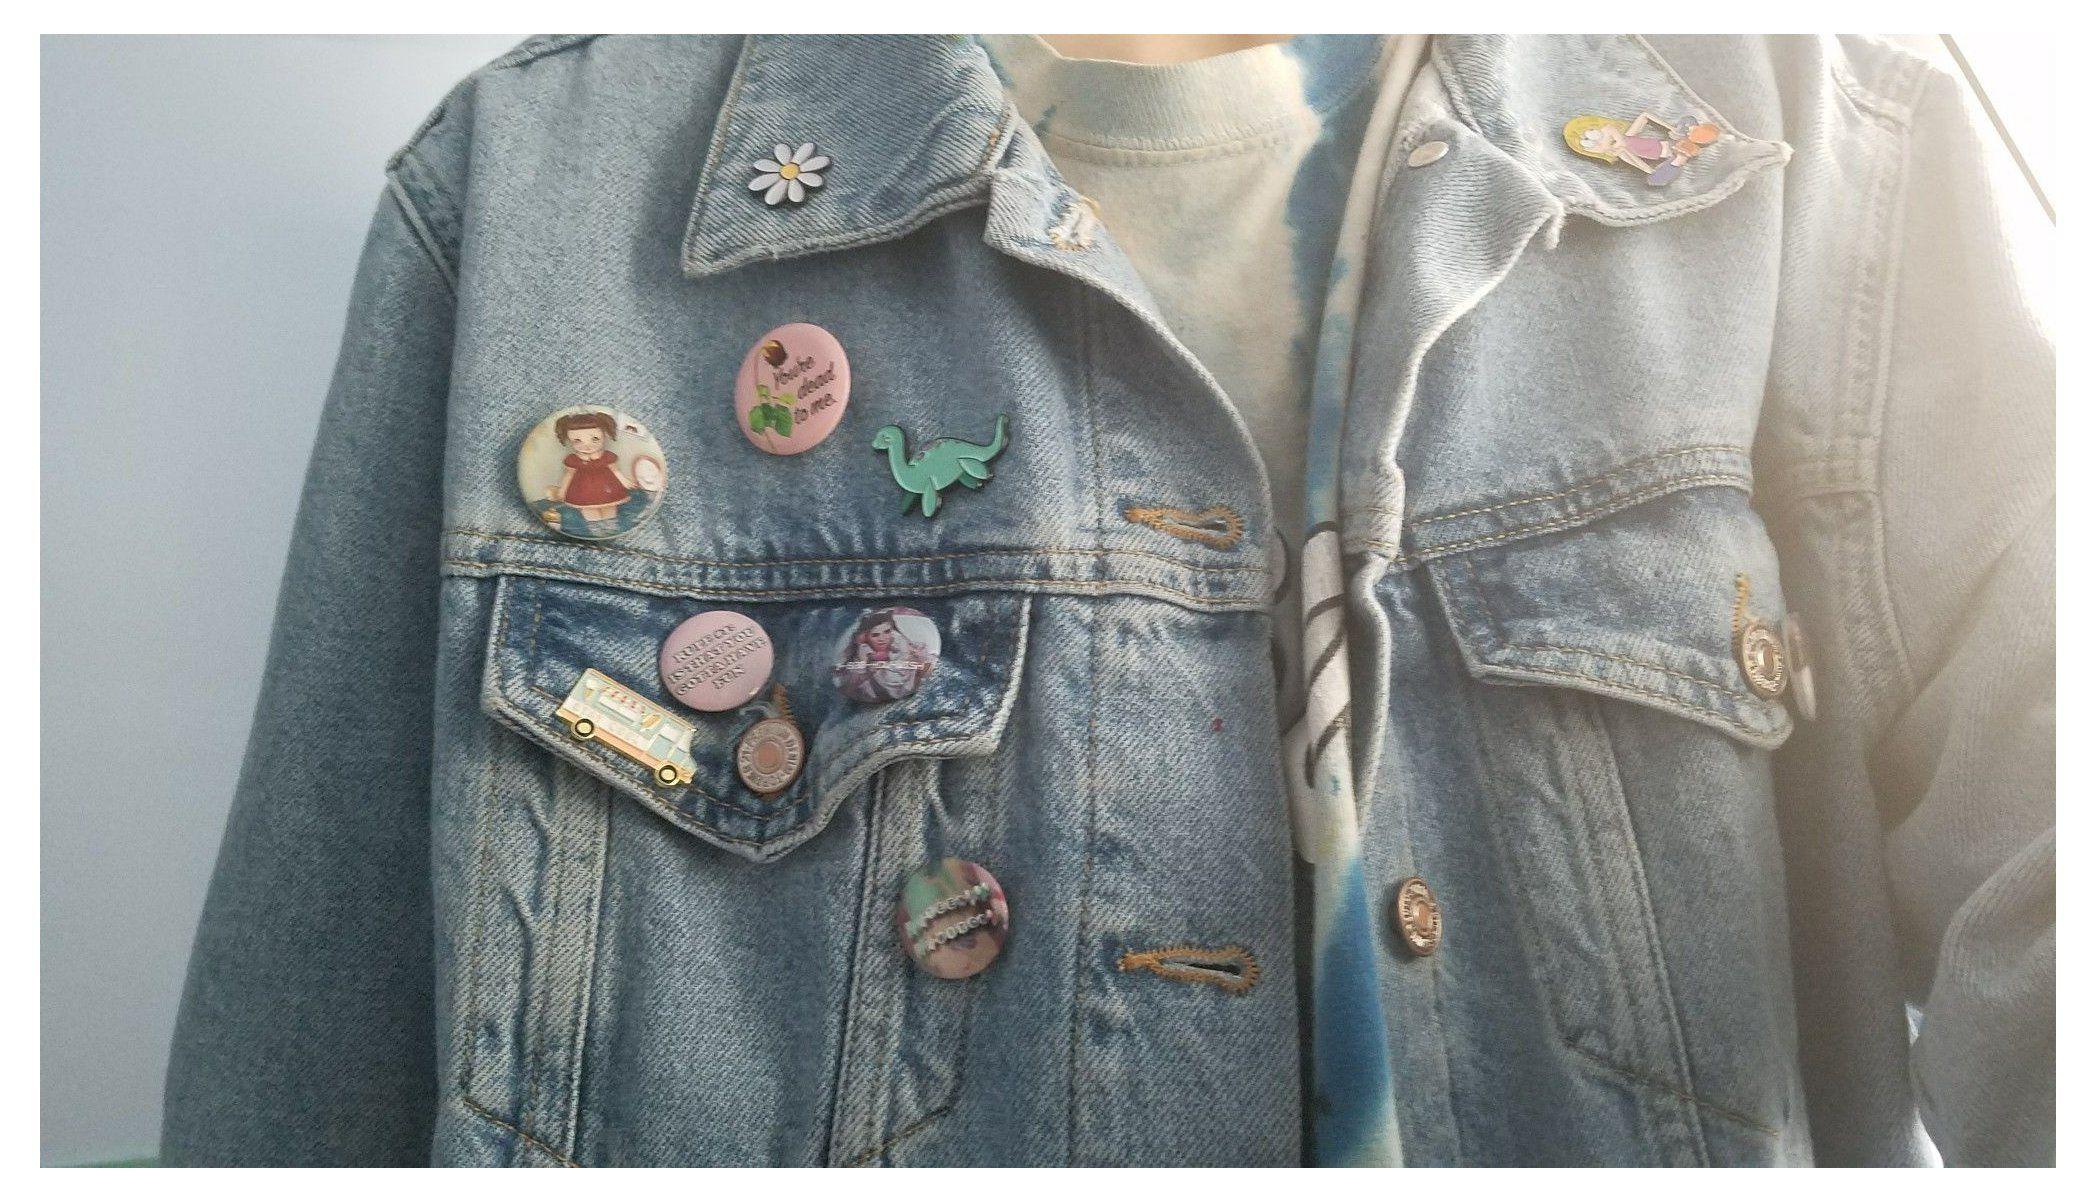 Button Pins On Denim Jacket Buttonpinsondenimjacket Pinterest Sadwhore In 2021 Pins On Denim Jacket Fashion Jackets [ 1202 x 2096 Pixel ]